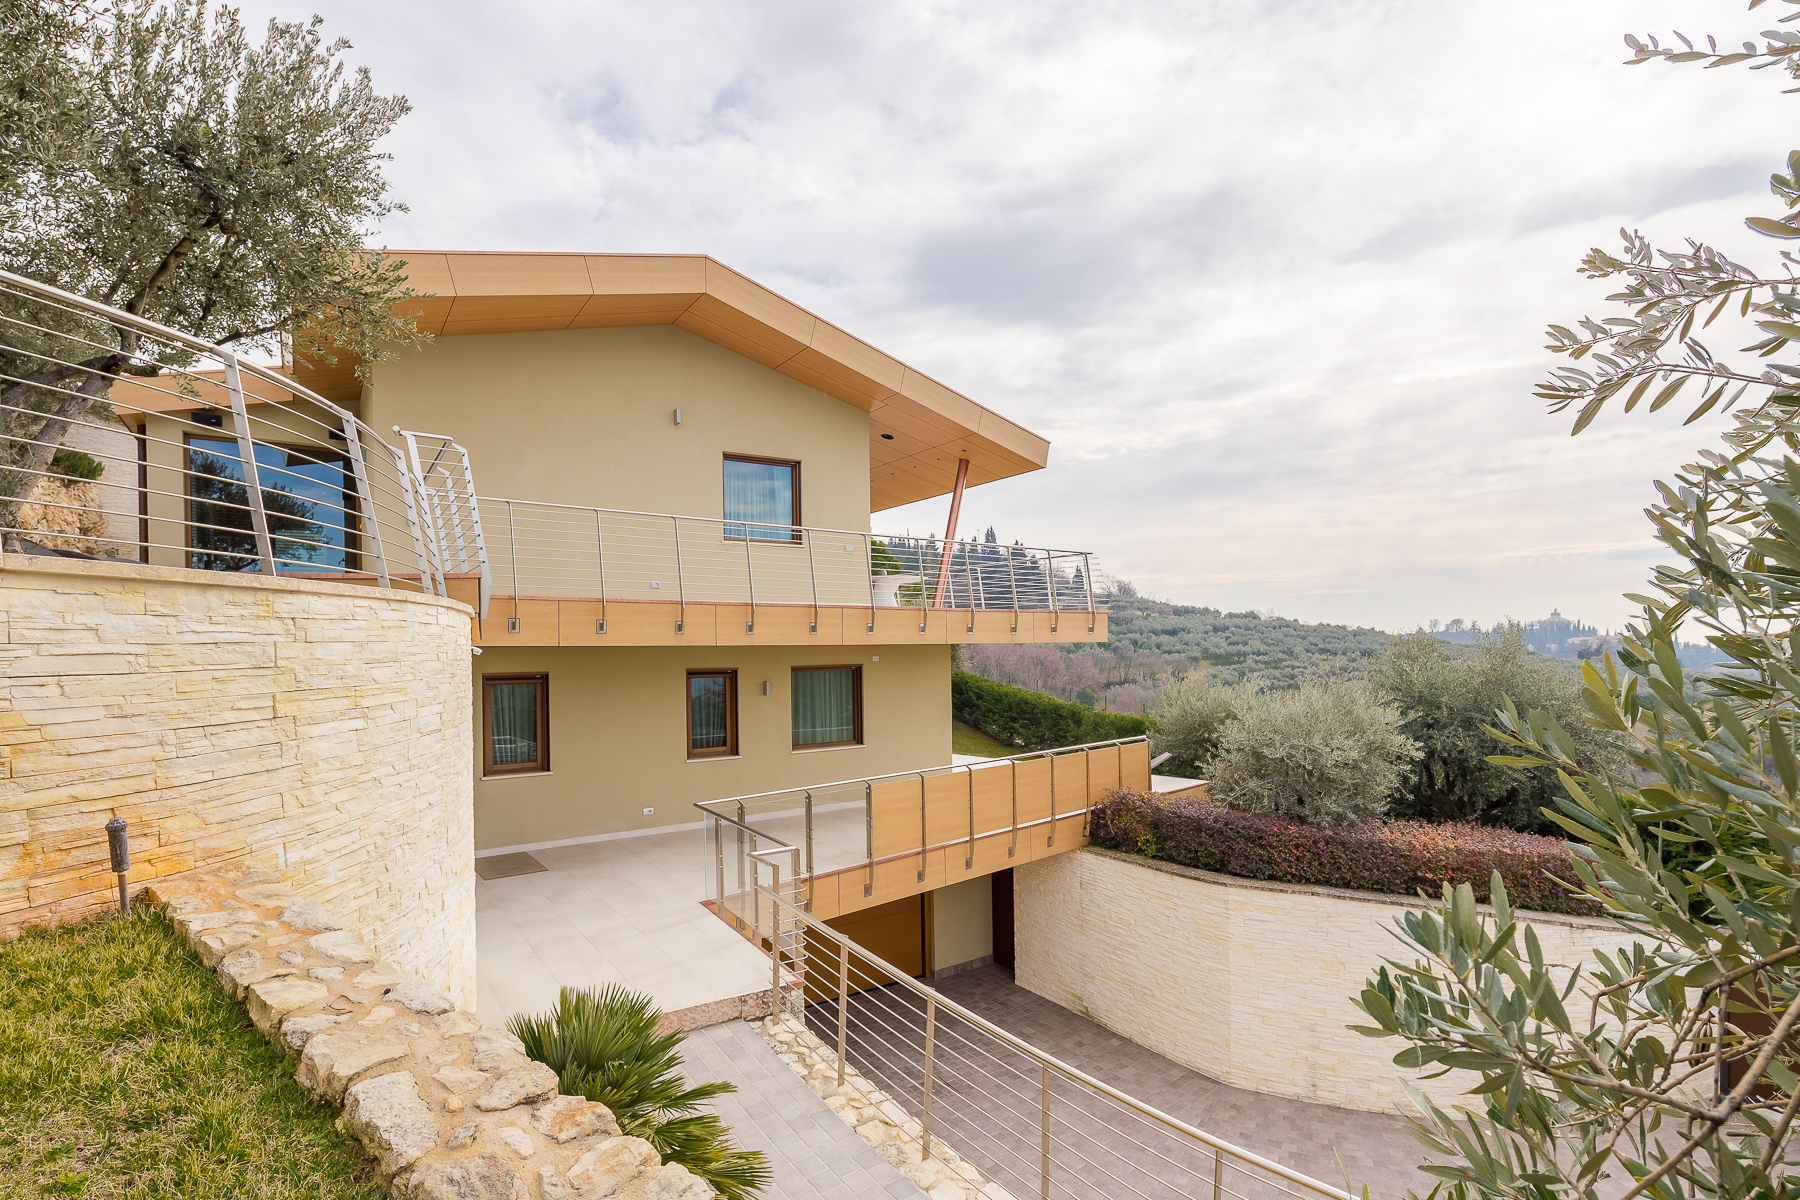 Villa in Vendita a Verona: 5 locali, 630 mq - Foto 22